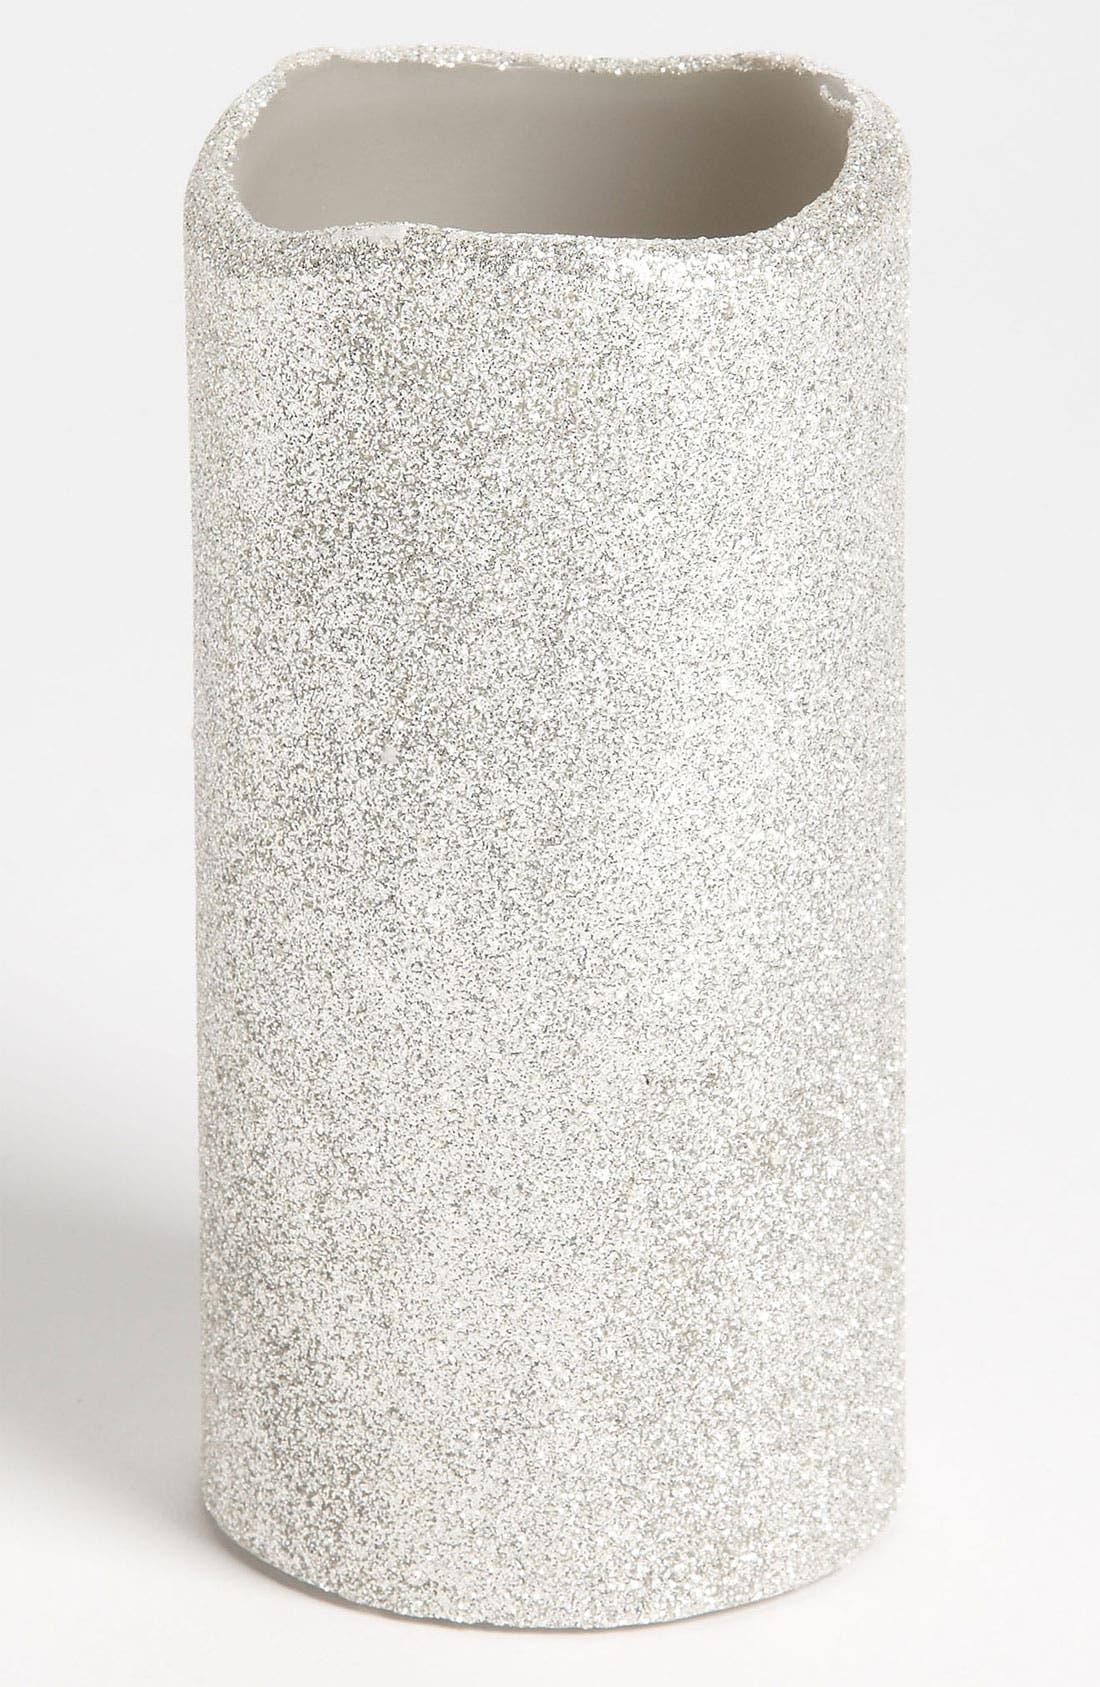 Alternate Image 1 Selected - Melrose Gifts Melted Glitter LED Candle